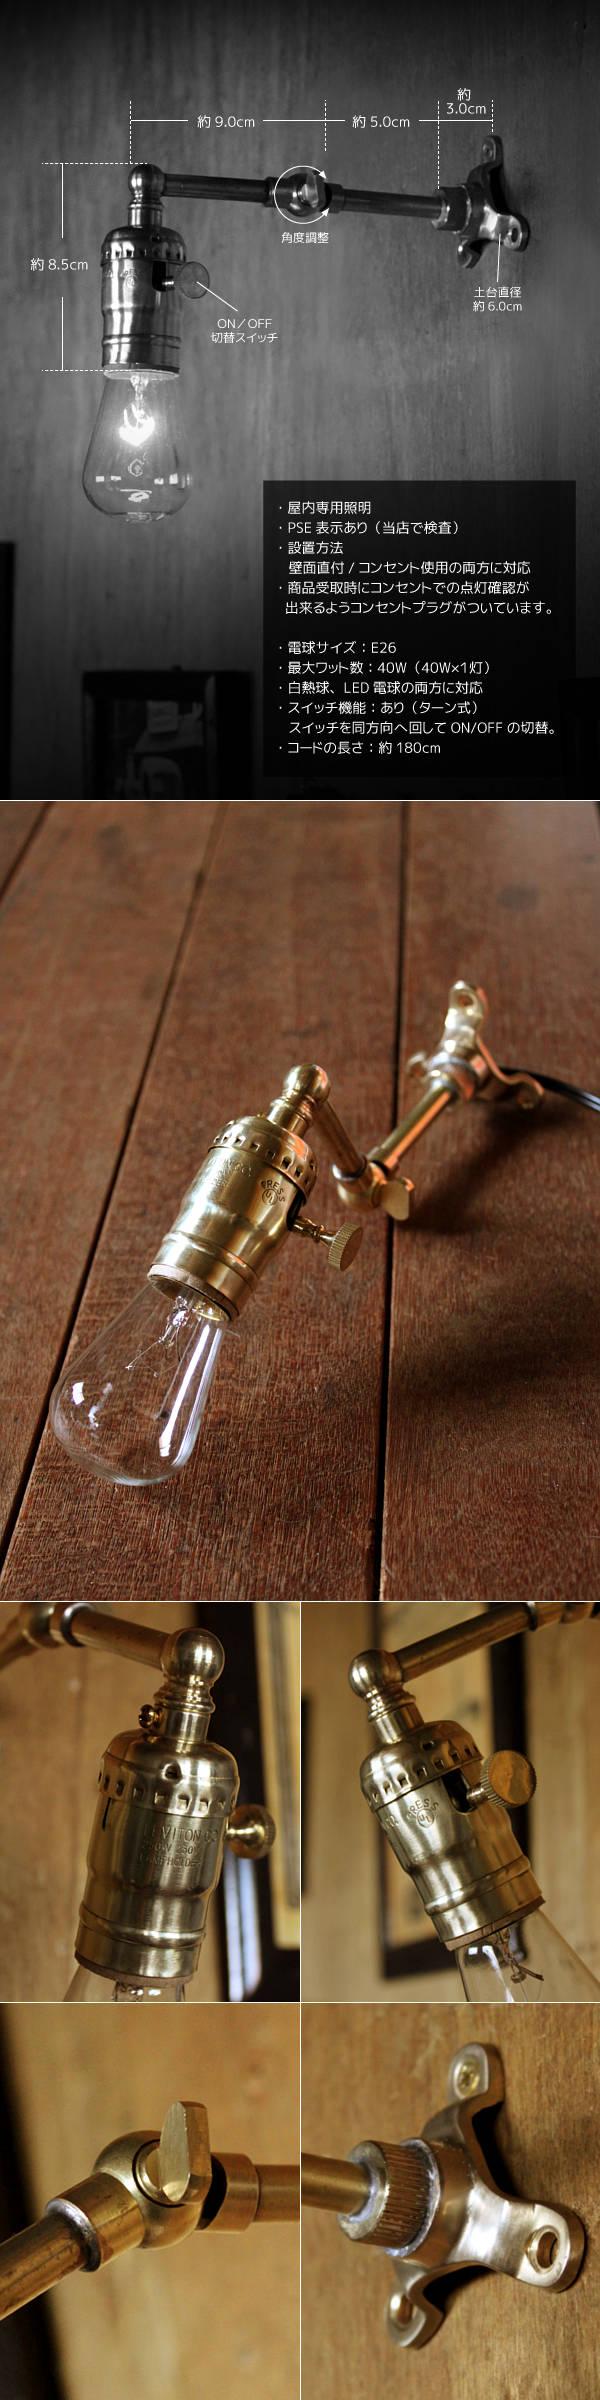 LEVITON社製真鍮ソケット&角度調整付きミニブラケット/インダストリアル工業系ウォールランプ壁面照明